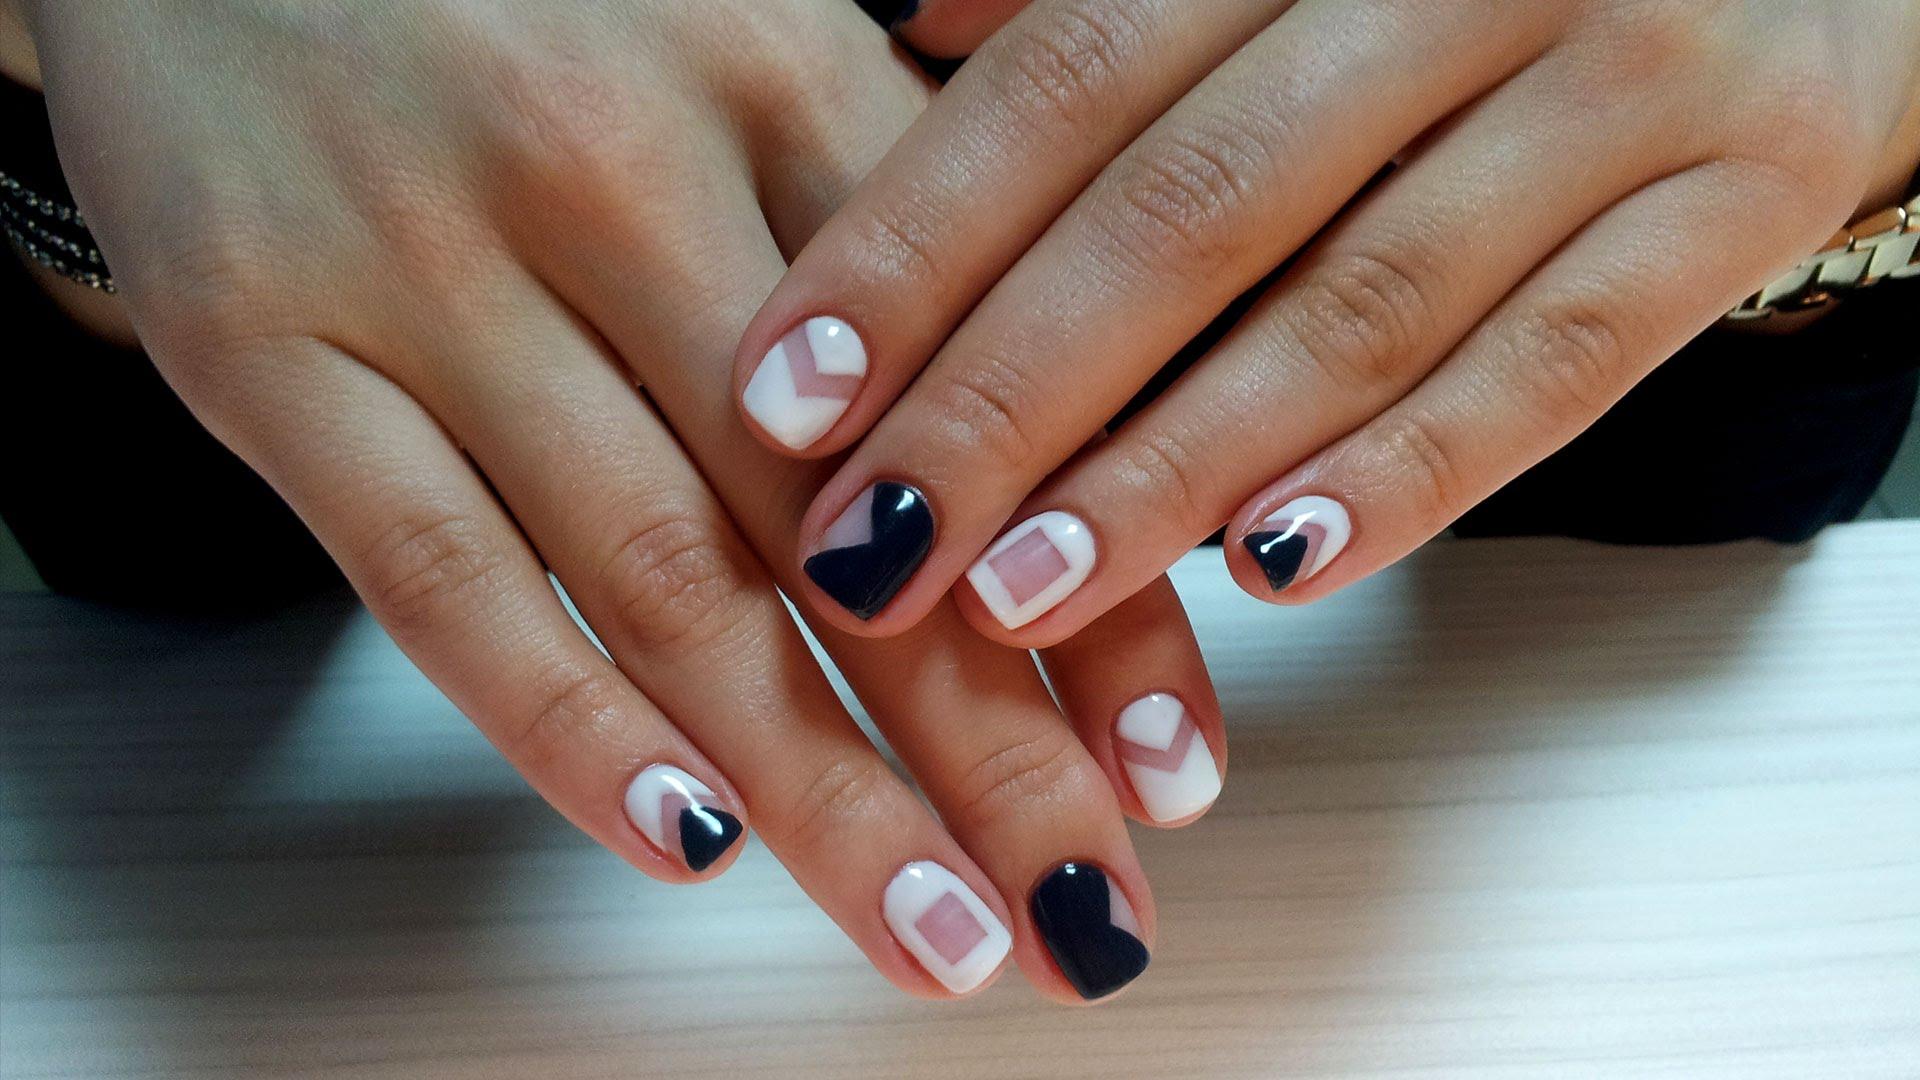 Дизайн ногтей шеллаком — фото новинки ...: receptibogini.ru/dizajn-nogtej-shellakom-33-foto-novinki-2016